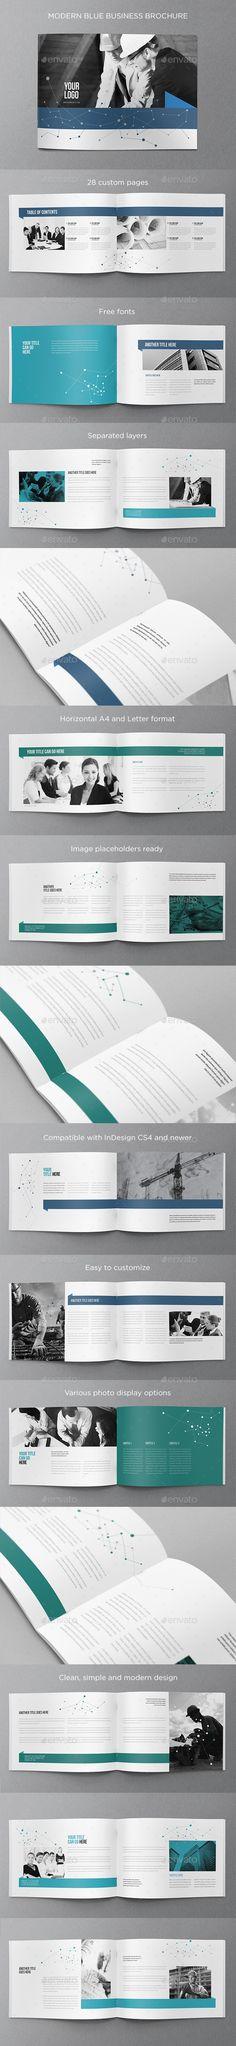 Modern Blue Business Brochure (CS4, 8.5x11, a4, blue, brochure, business, clean, corporate, flexible, letter, minimal, modern, professional, simple, white)